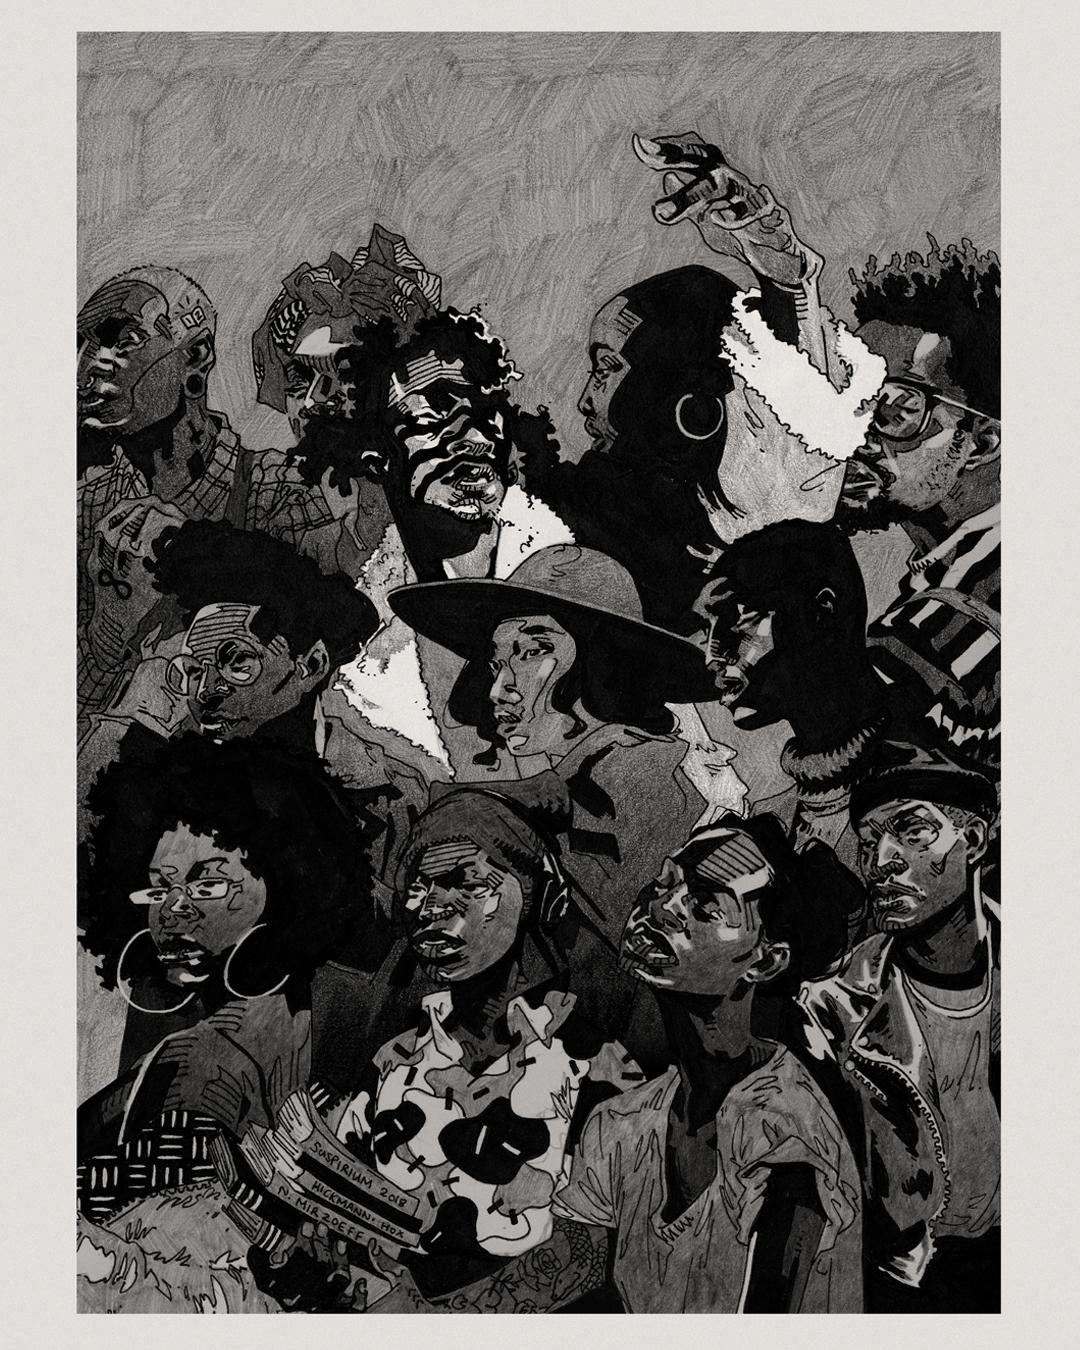 'Mountains iii' (2019) is taken from Pola Maneli's exhibition 'An Indigenous I/Eye'